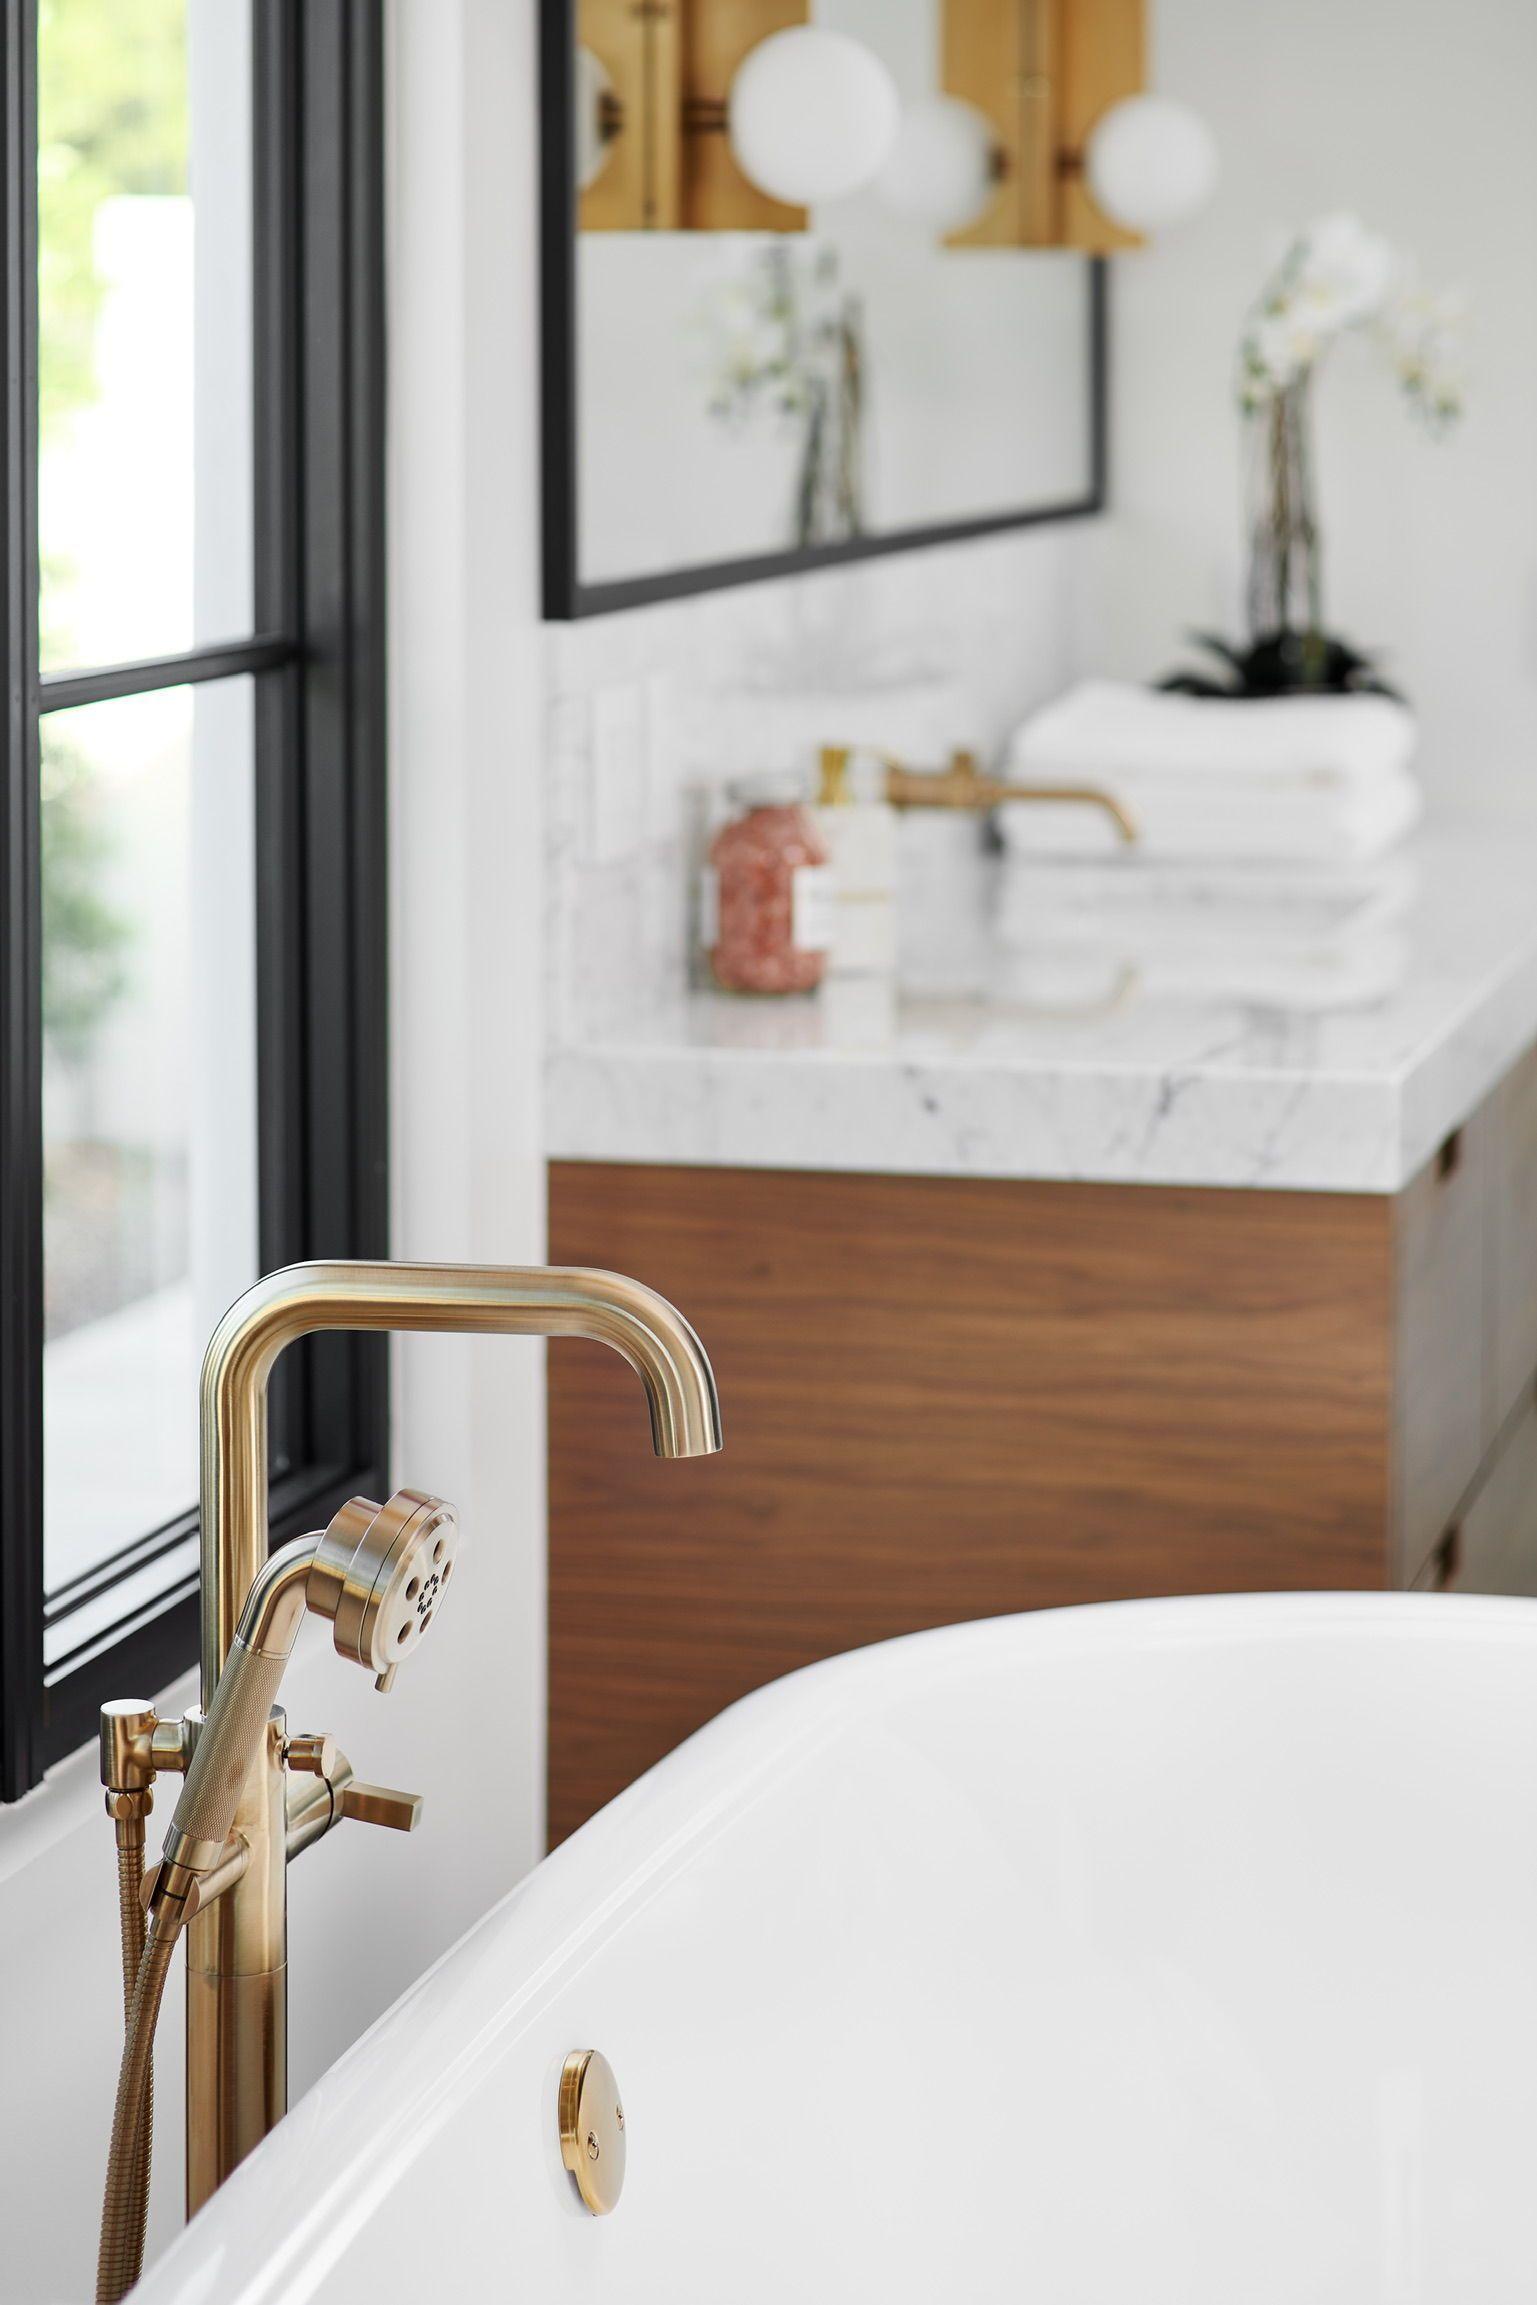 Brushed Brass Fixtures Modern Bathroom Decor Best Bathroom Designs Contemporary Master Bathroom